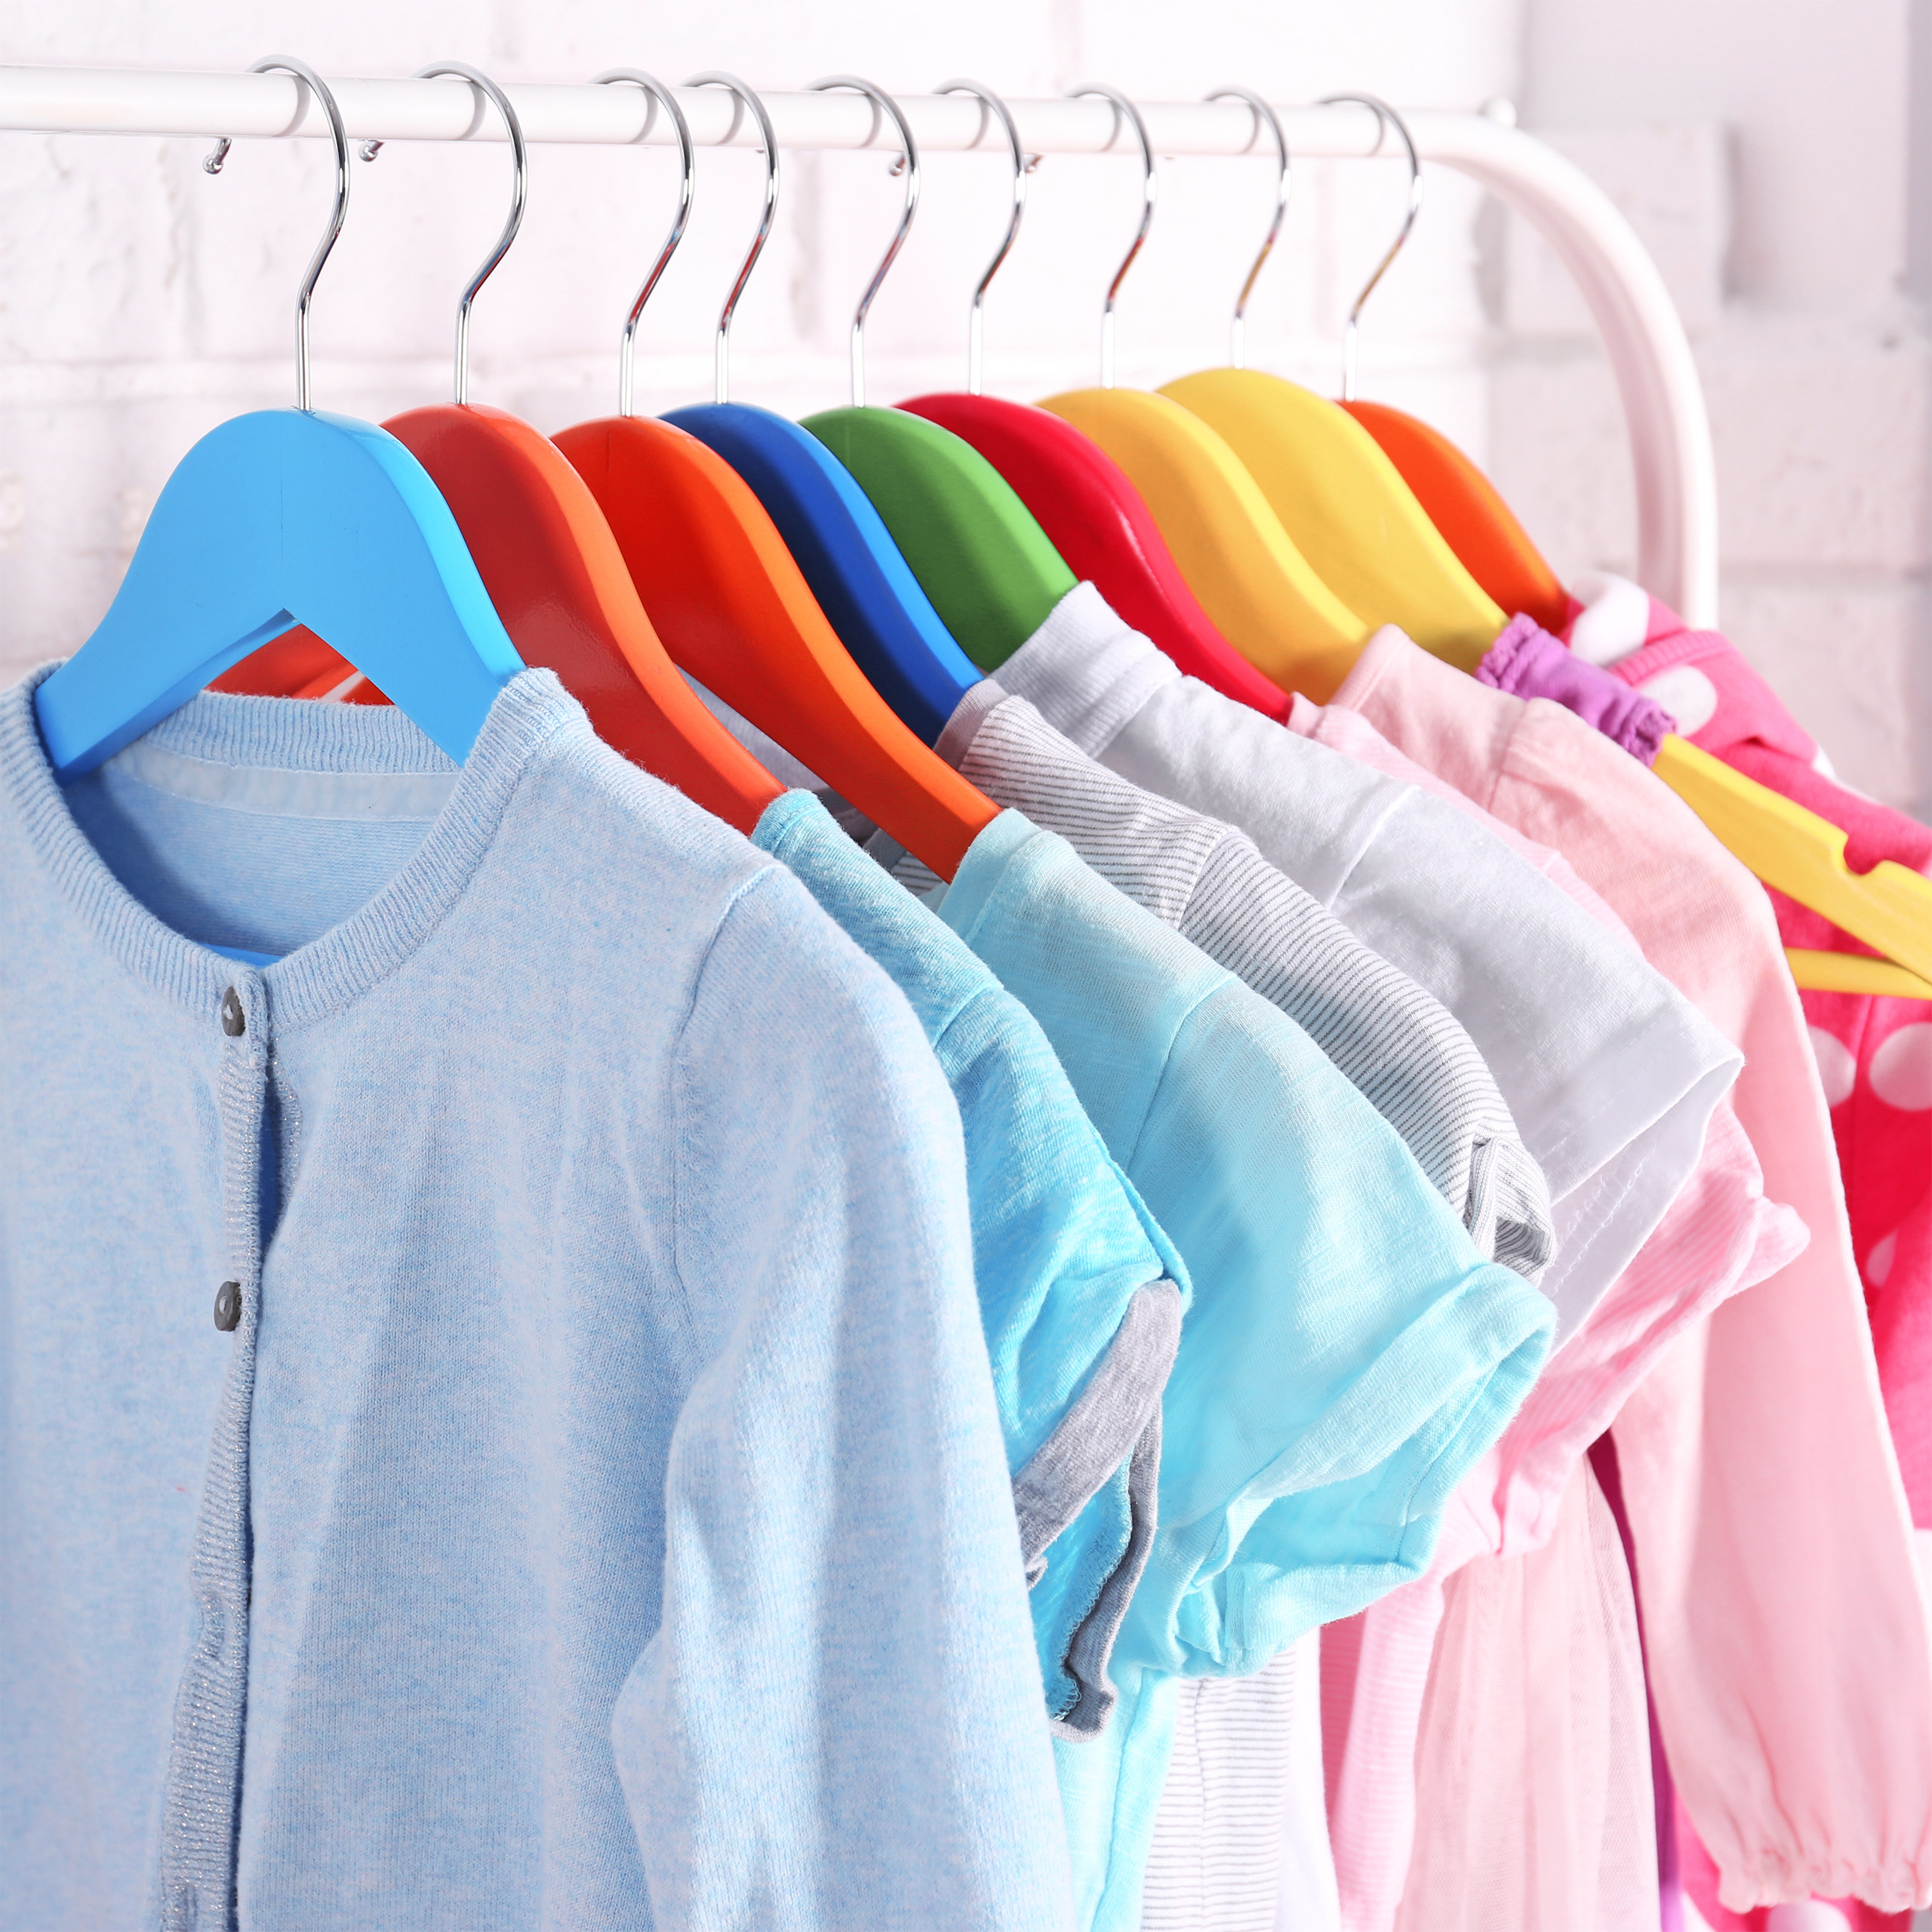 Kleiderbügel Kinder 20er Set Babybügel Holzbügel Hemdbügel Kinderkleiderbügel